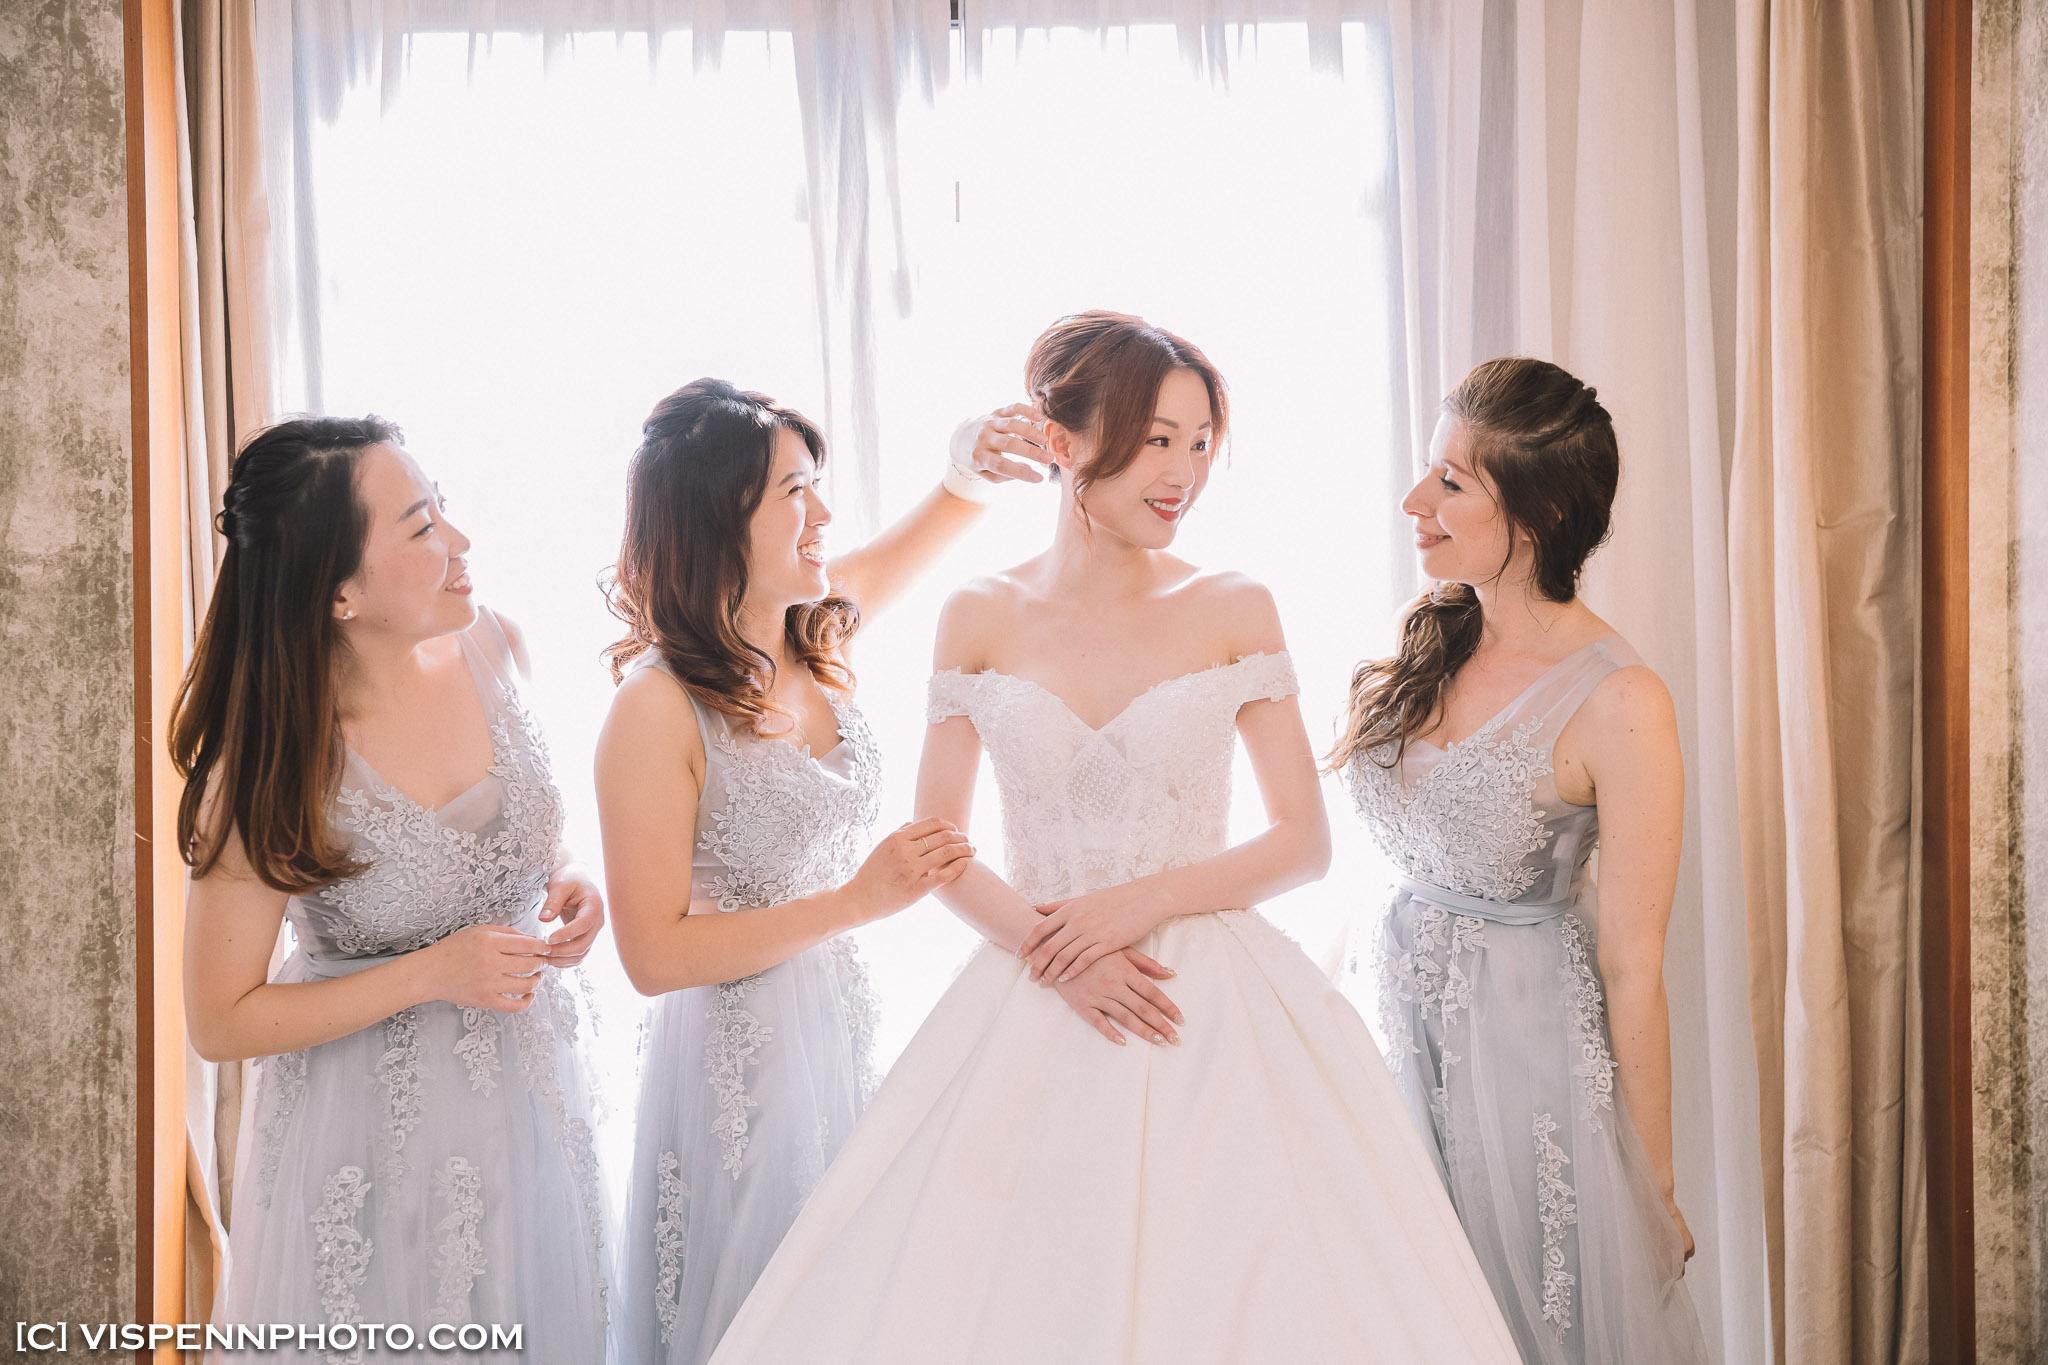 WEDDING DAY Photography Melbourne ZHPENN 1P 1DX 00289